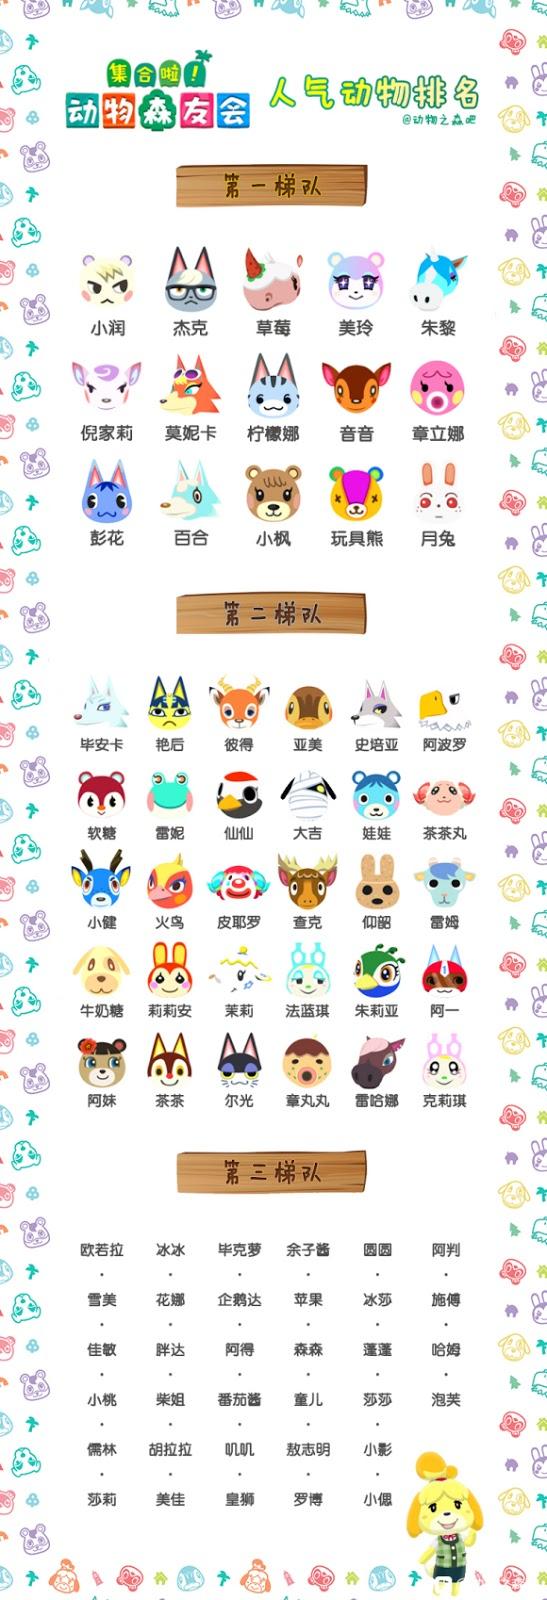 Animal Crossing人气动物排名